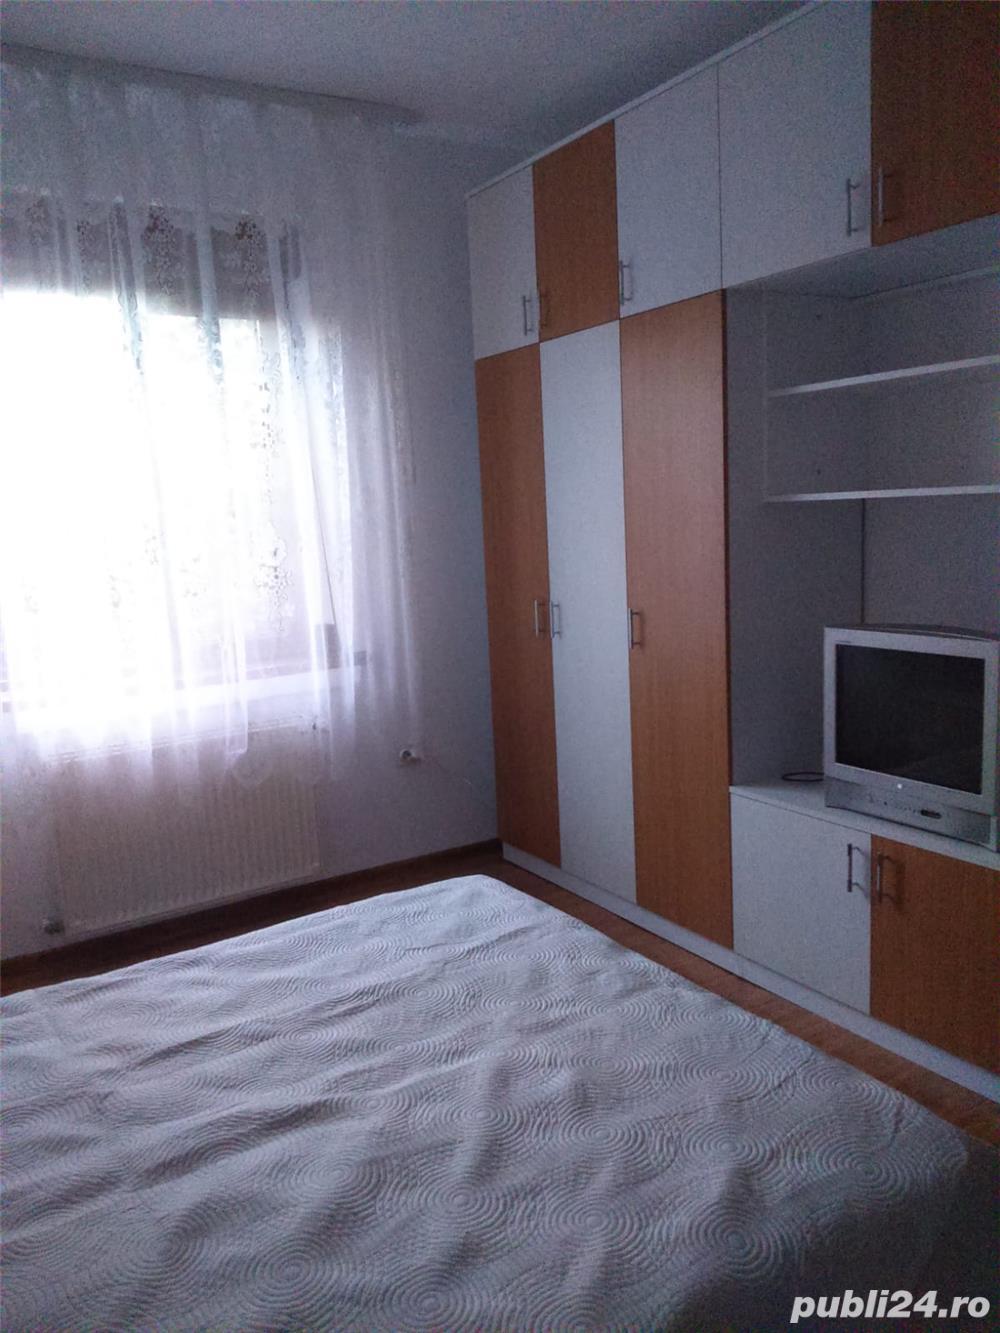 inchiriez apartament 2 camere, Pitesti, zona Traian